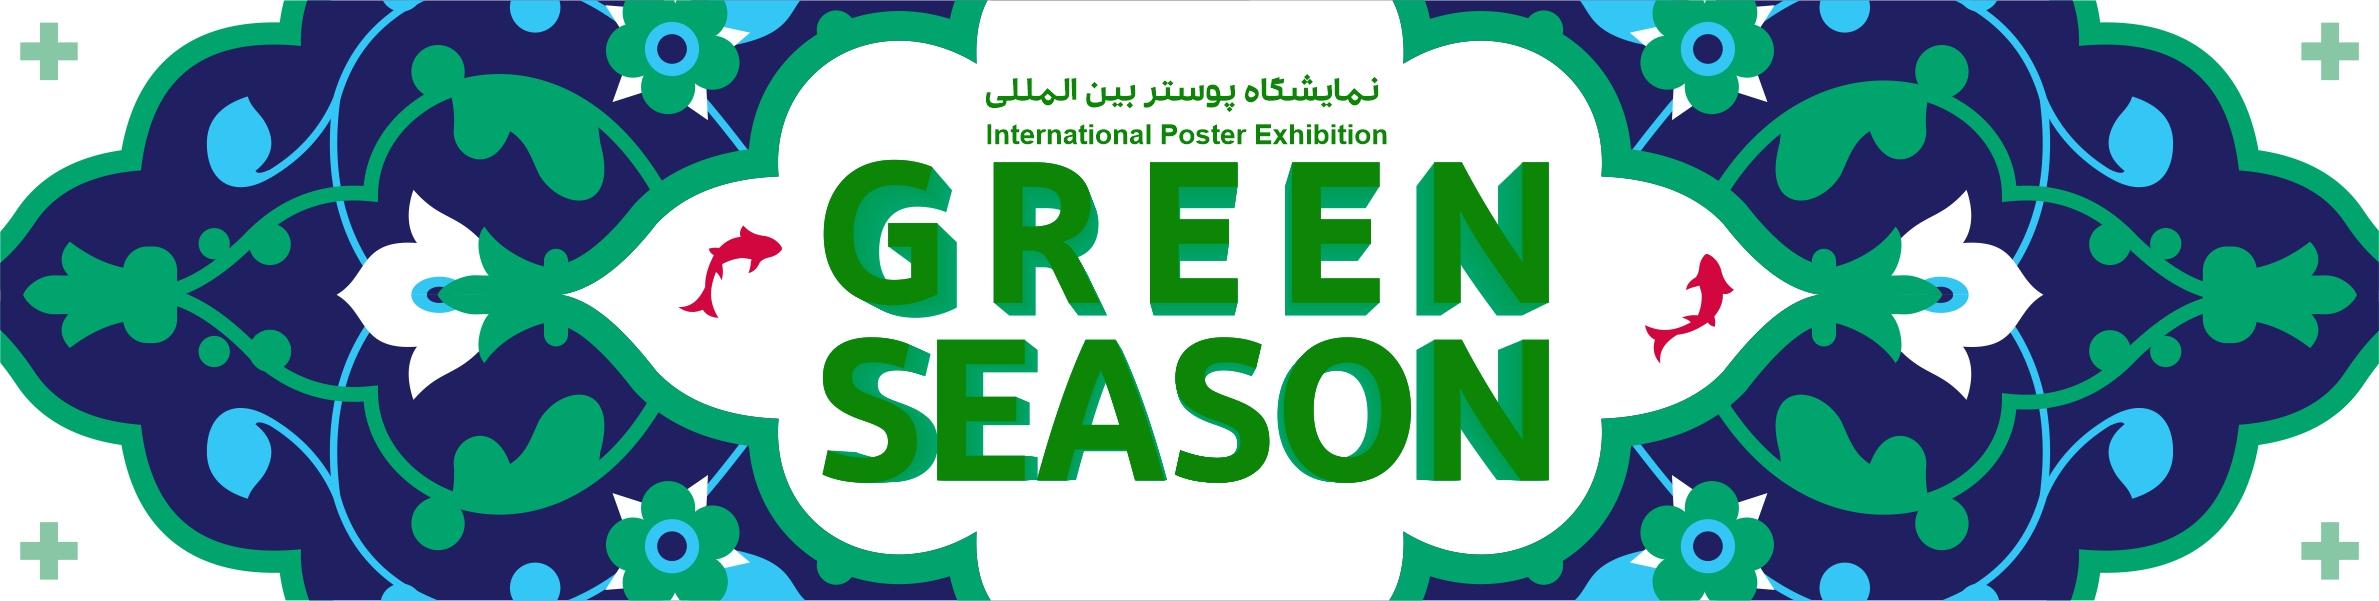 International Poster Exhibition Green Season